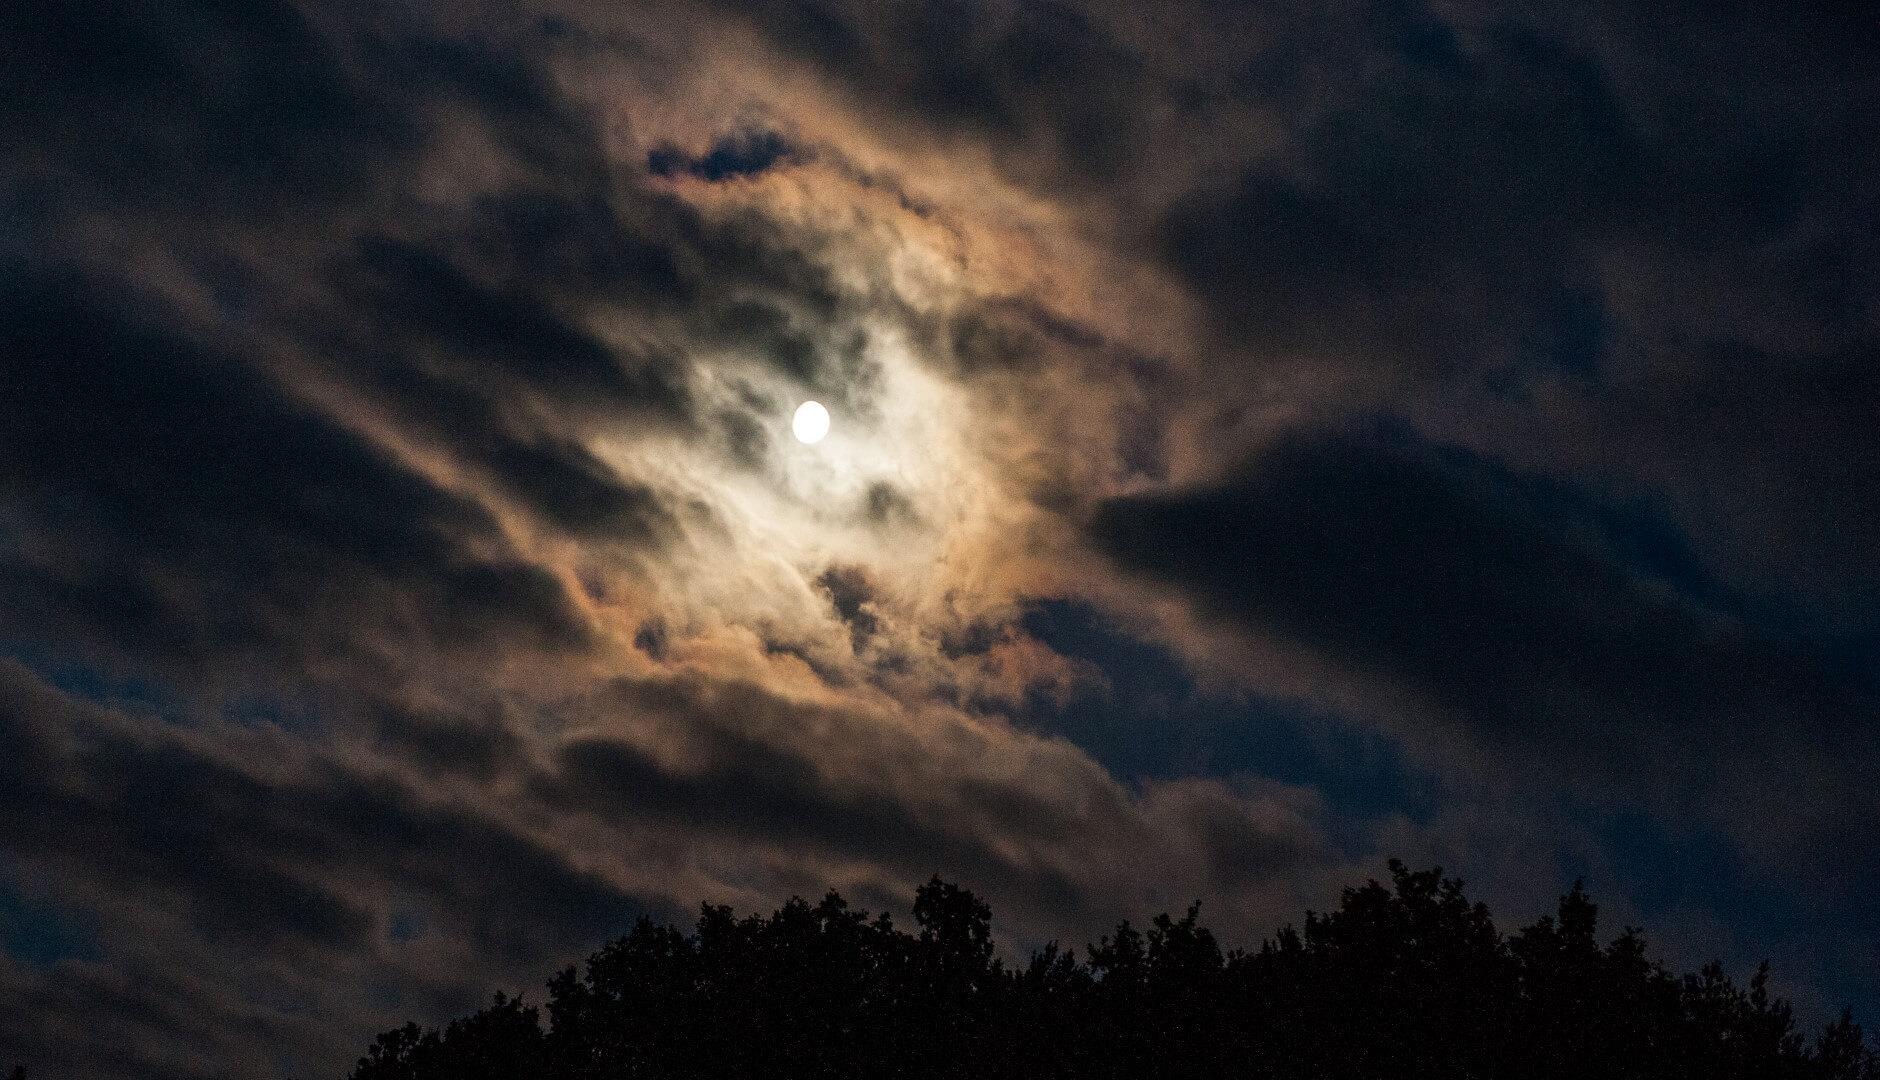 niebo-noc-ksiezyc